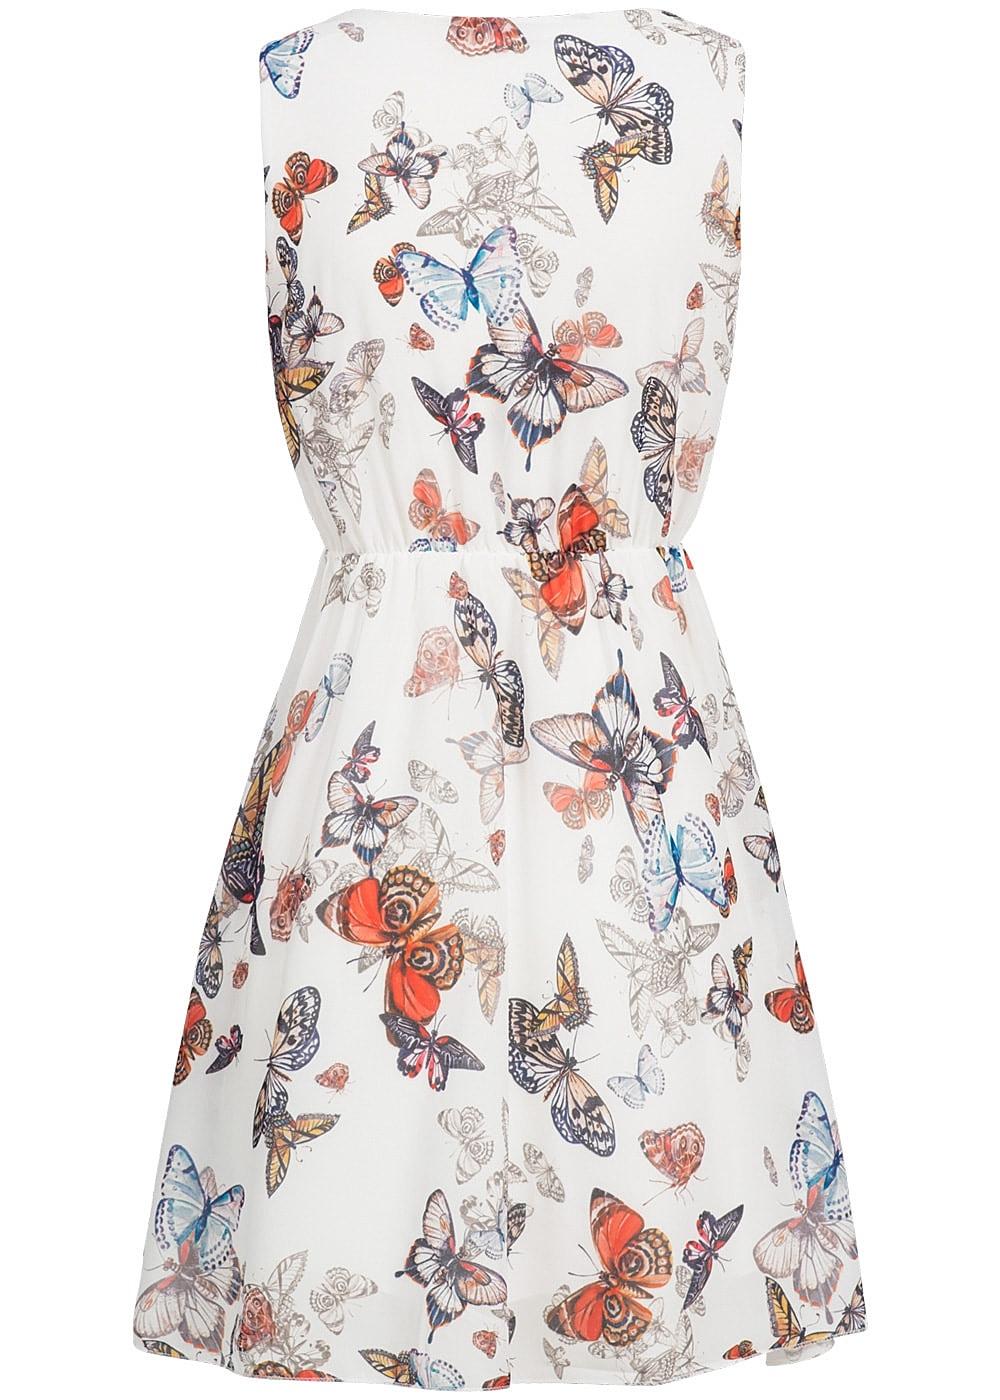 Styleboom Fashion Damen Mini Kleid Gummizug Schmetterling